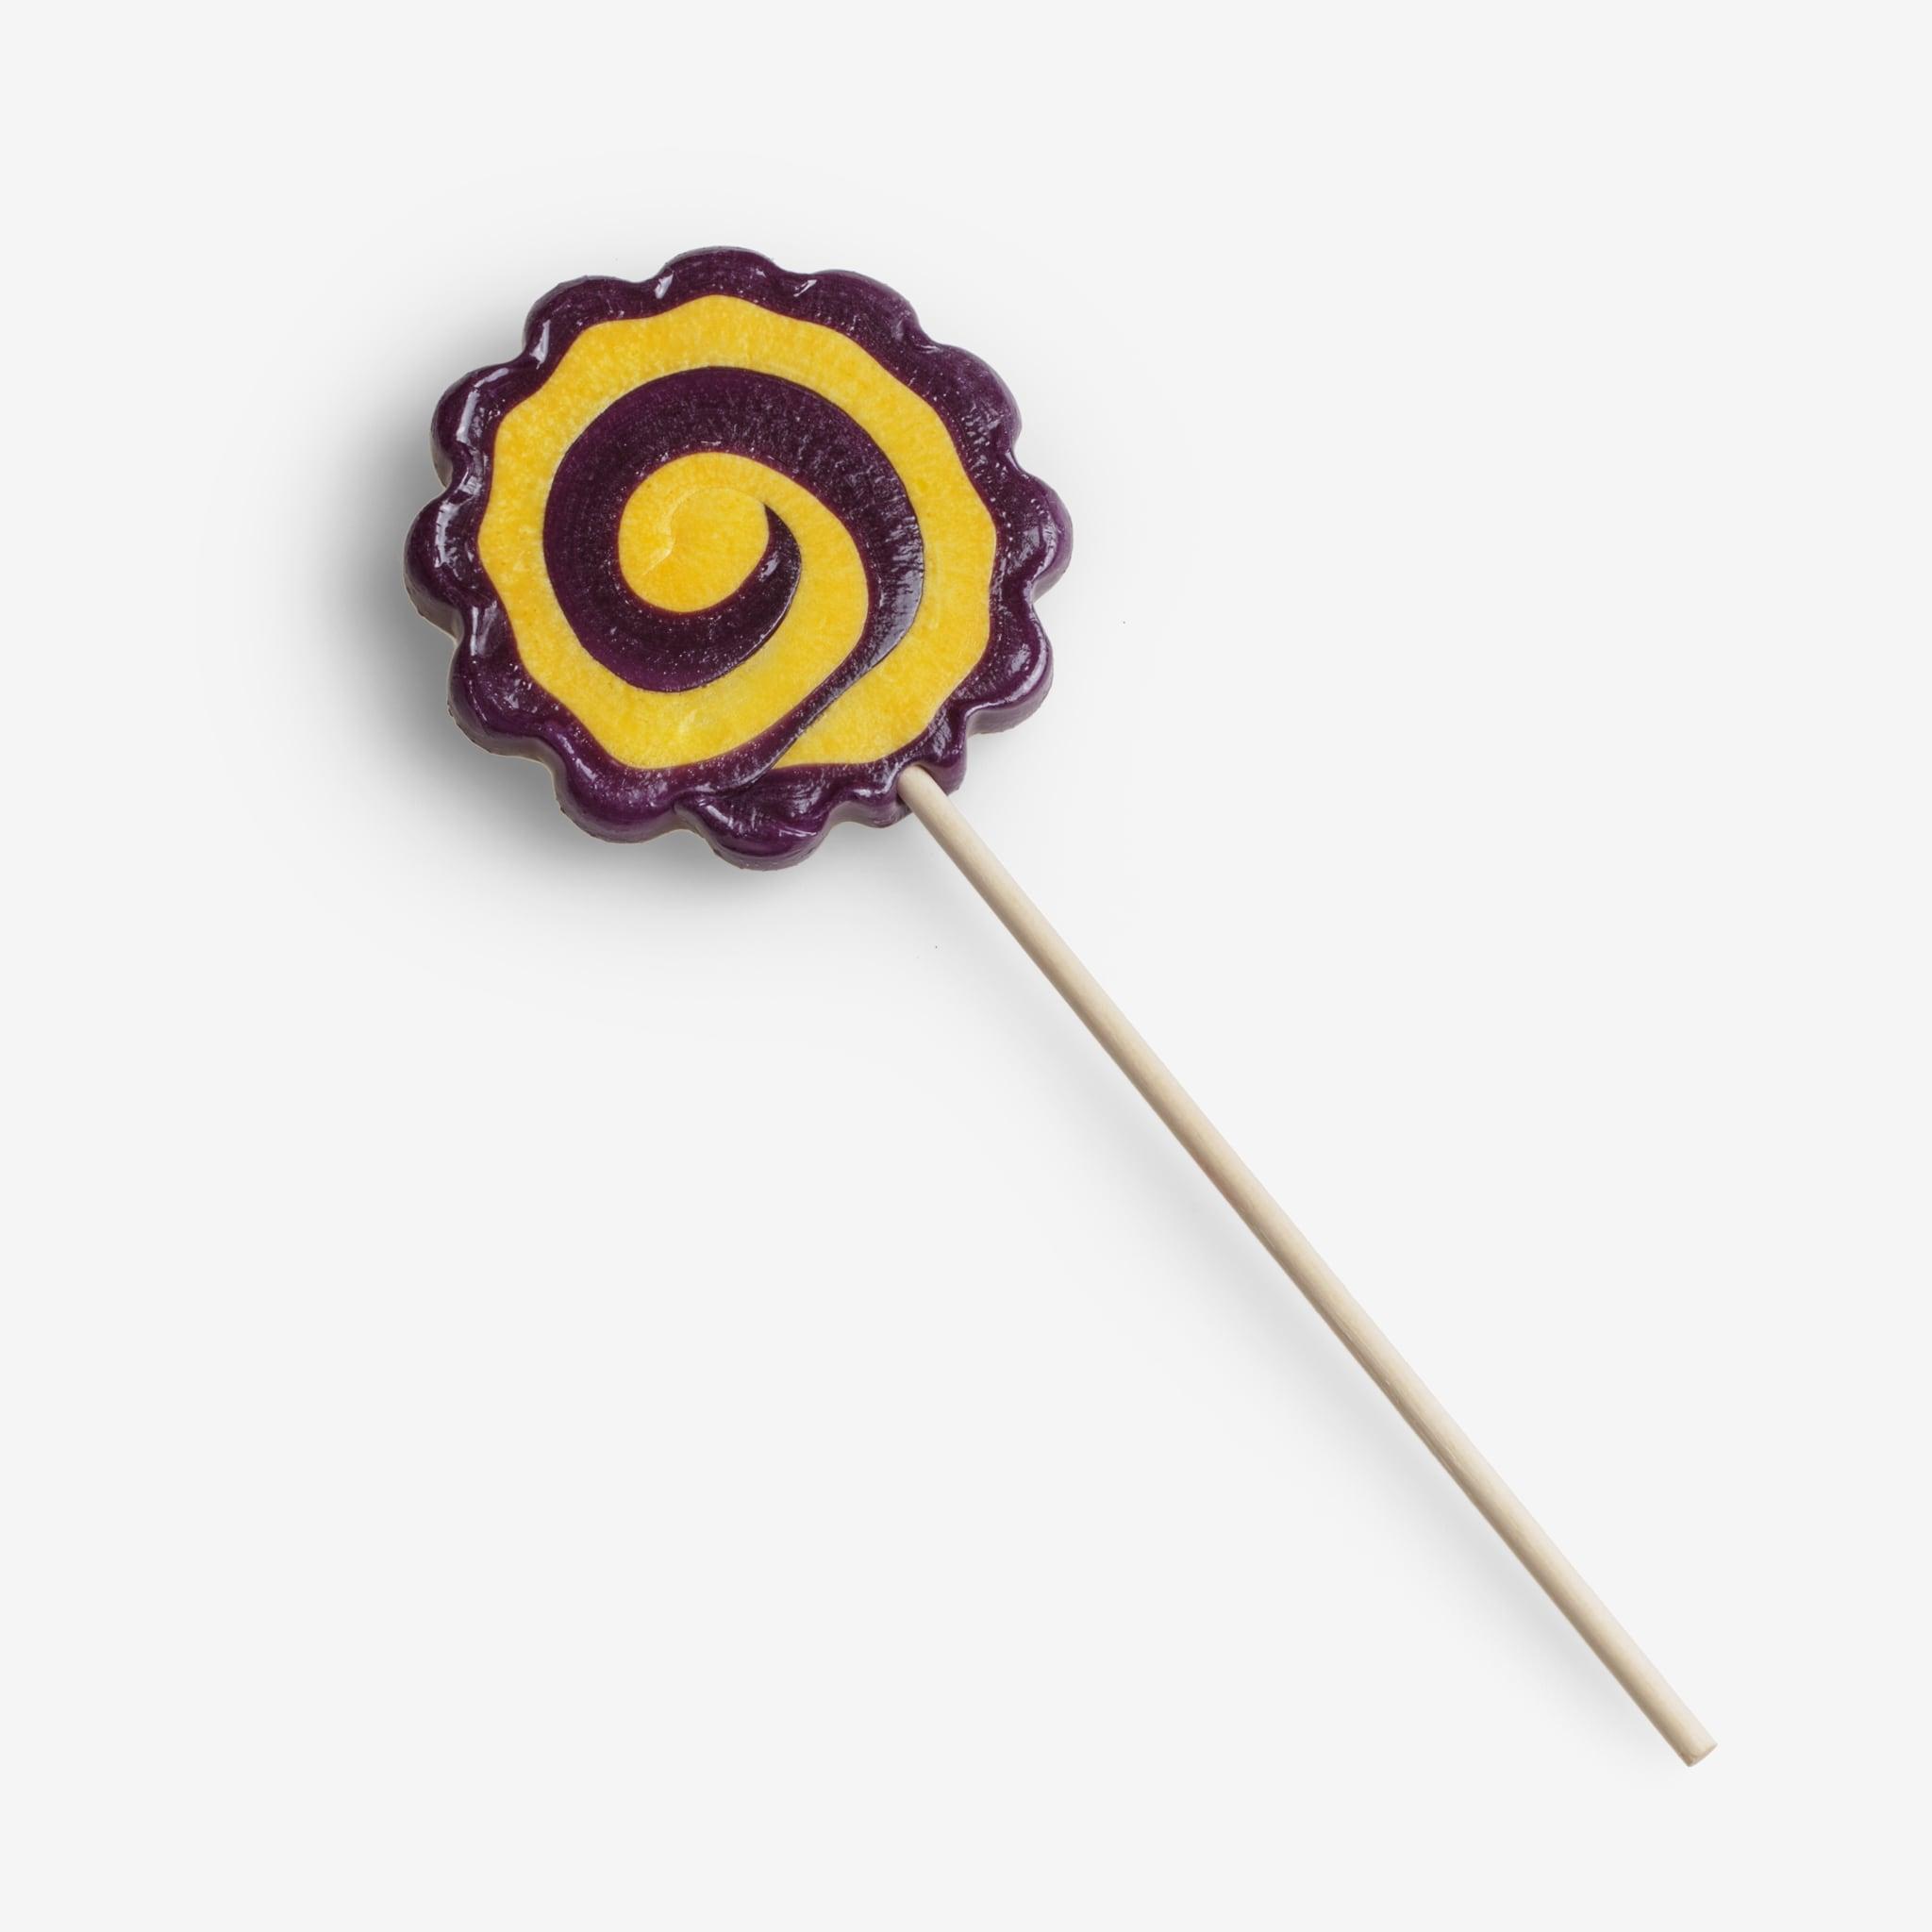 Lollipop image with transparent background